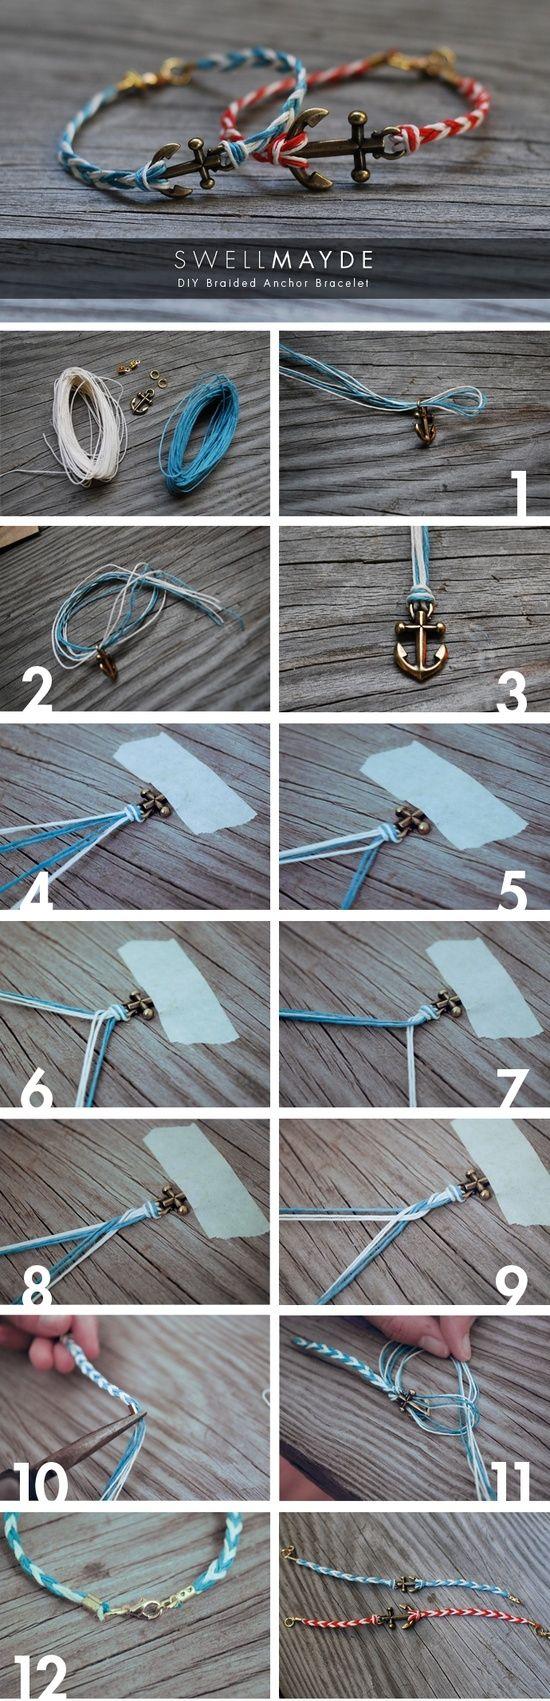 DIY braided anchor bracelet.